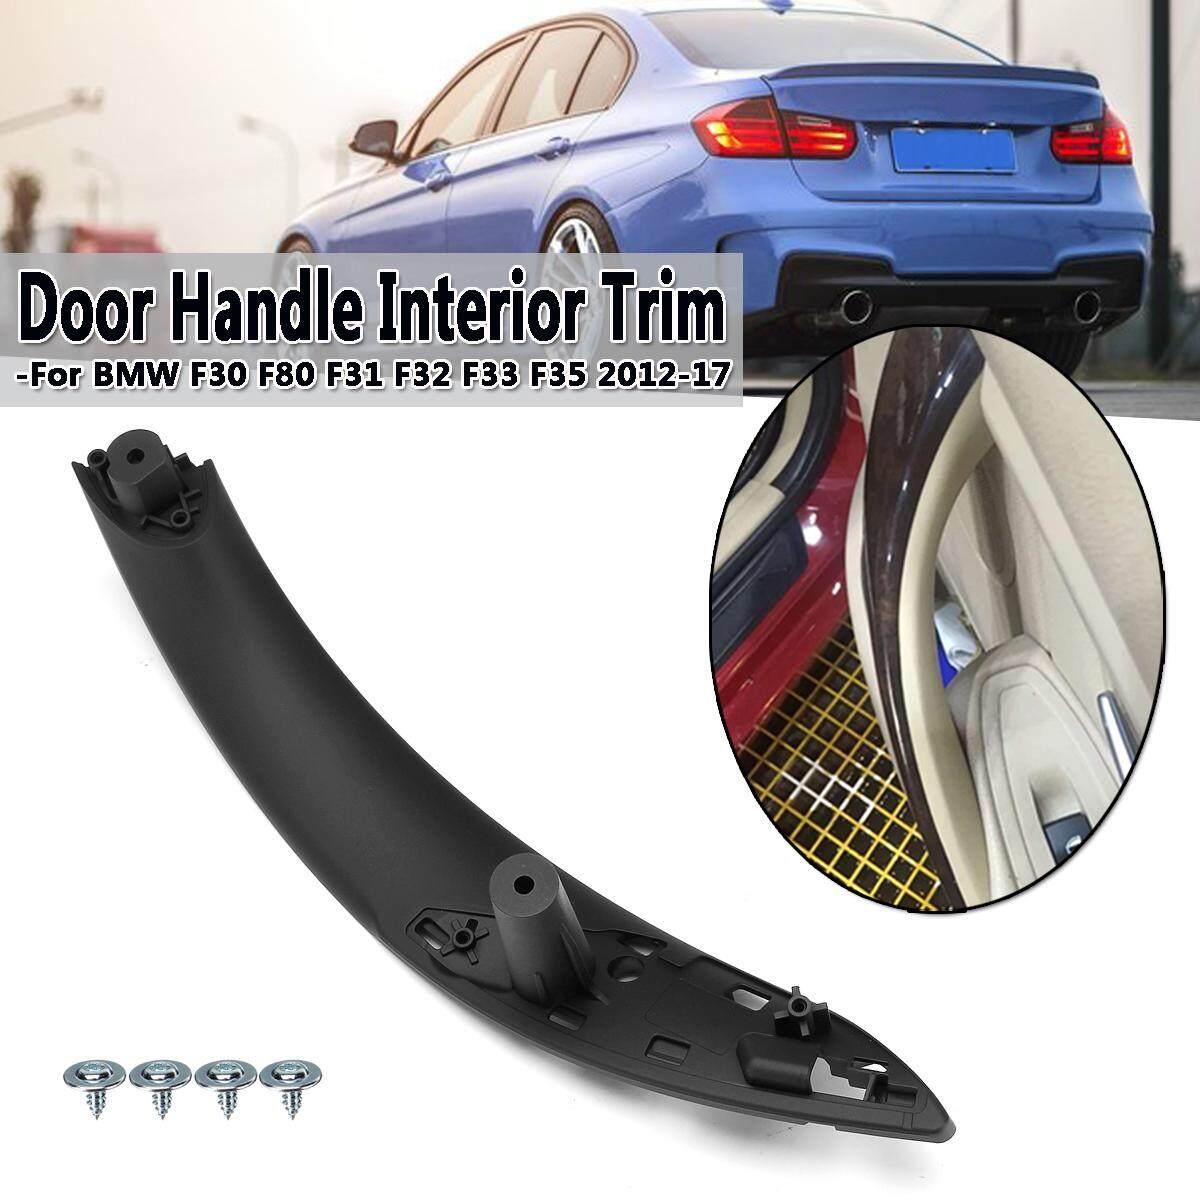 【Free Shipping + Flash Deal】Rear Left Door Pull Handle Interior Trim For  BMW F30 F80 F31 F32 F33 F35 2012-17